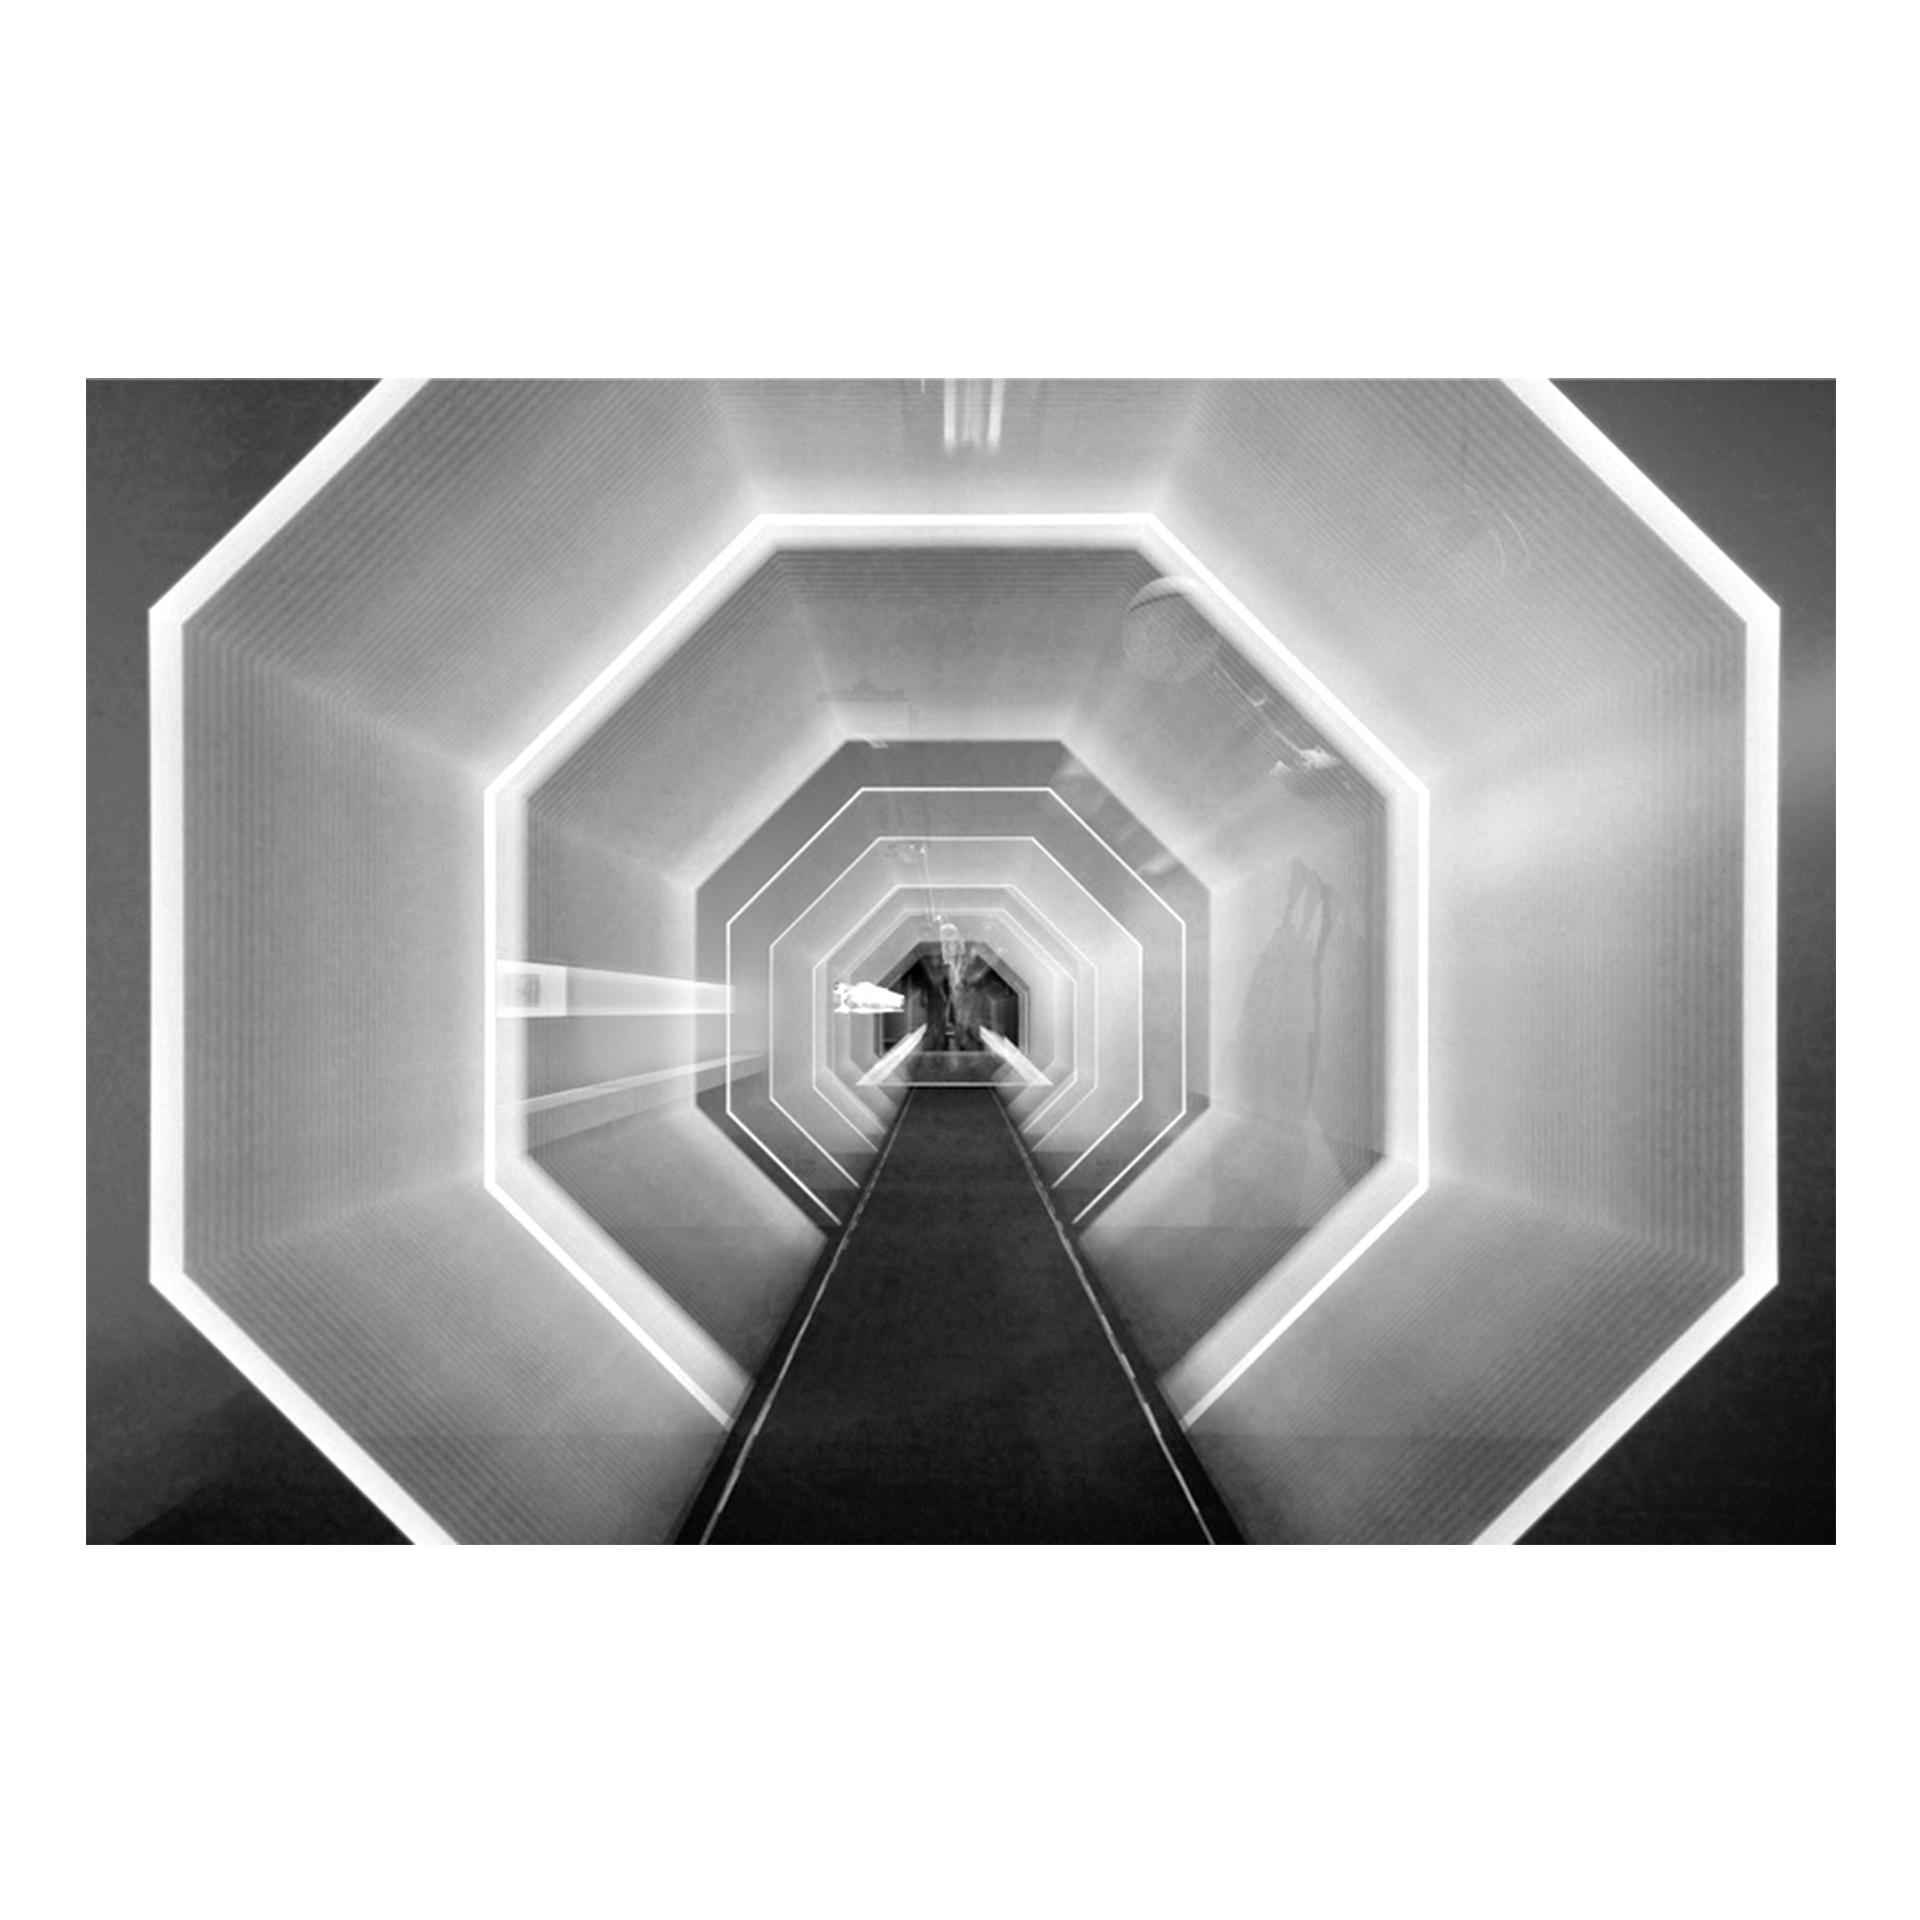 MvS Architects   |   Star Voyager